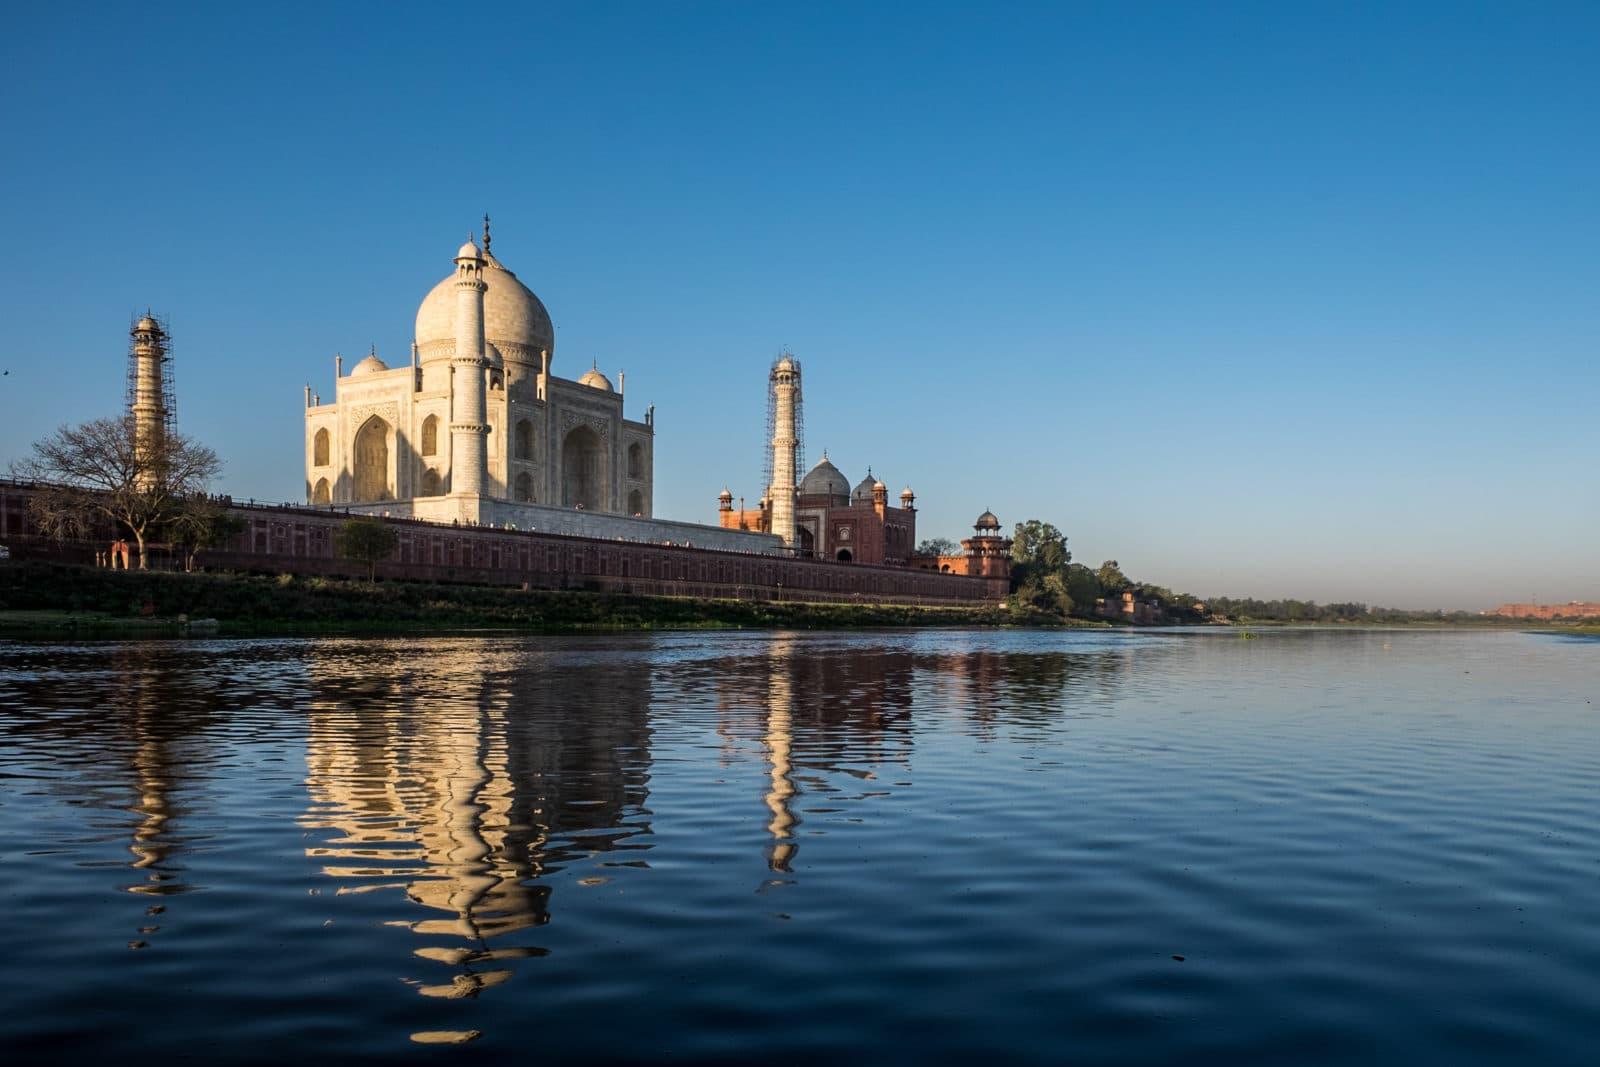 Taj Mahal from the Yamuna.